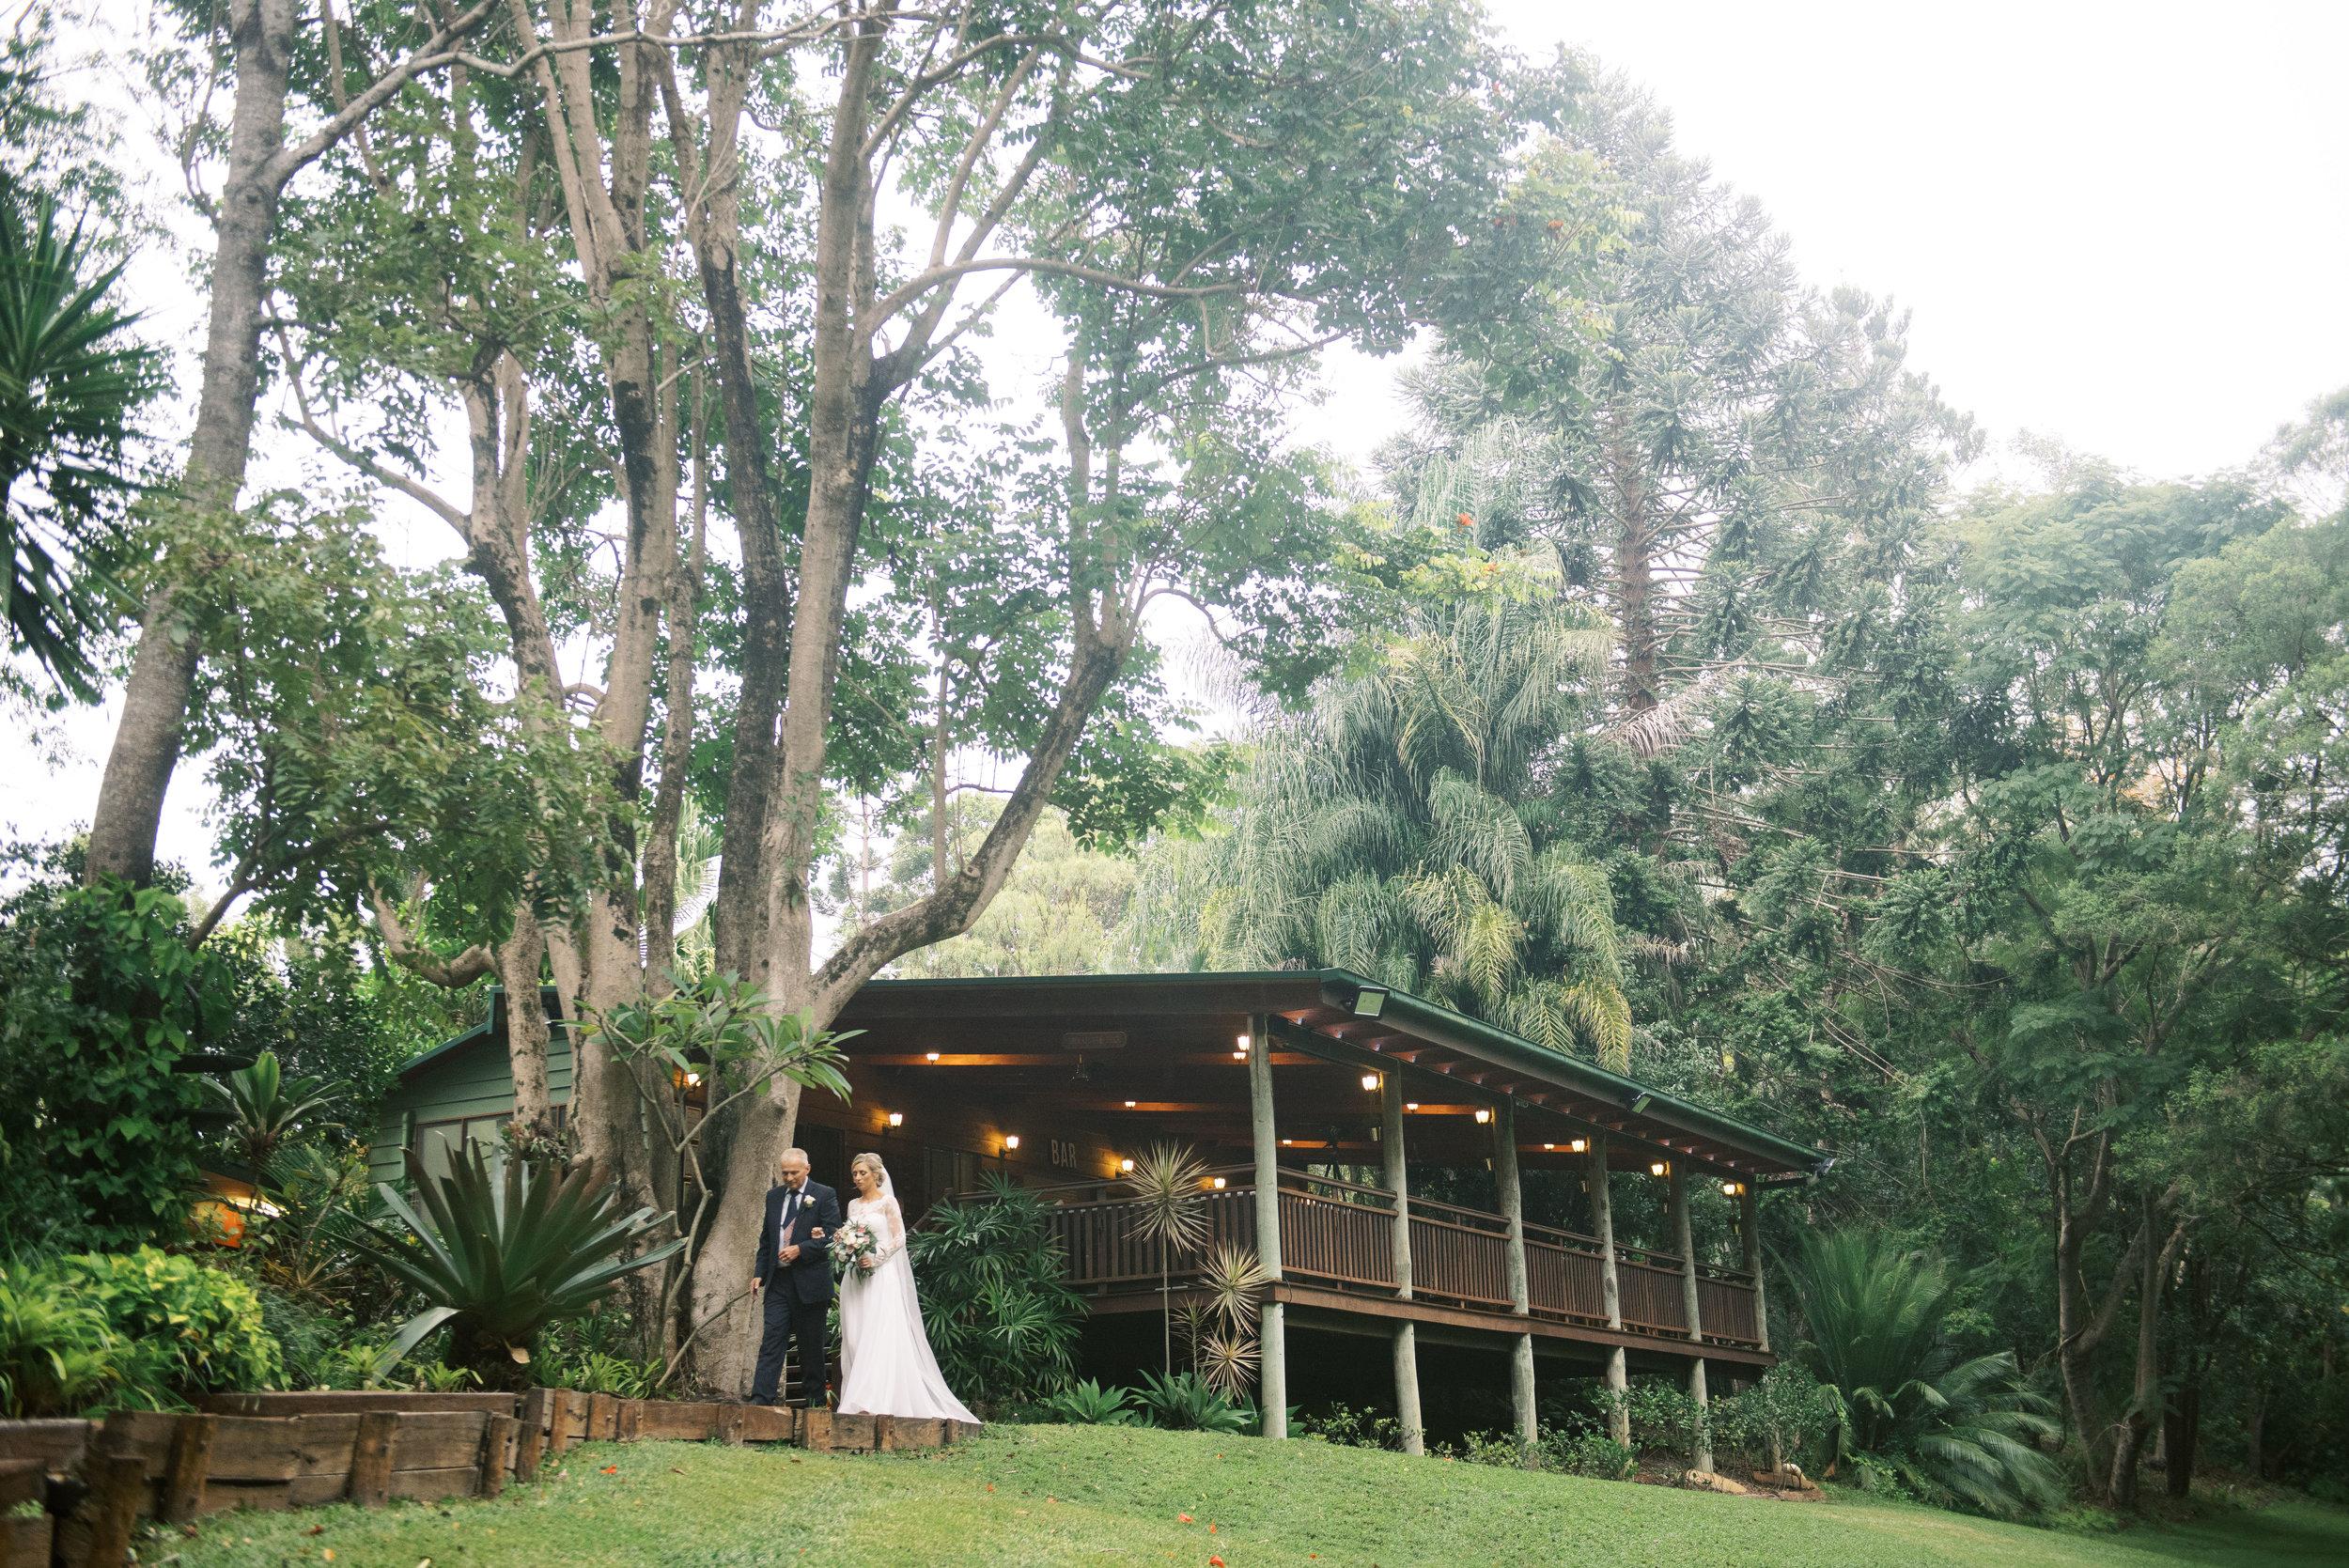 brisbane-gold-coast-sunshine-coast-romantic-wedding-photographer-46.jpg